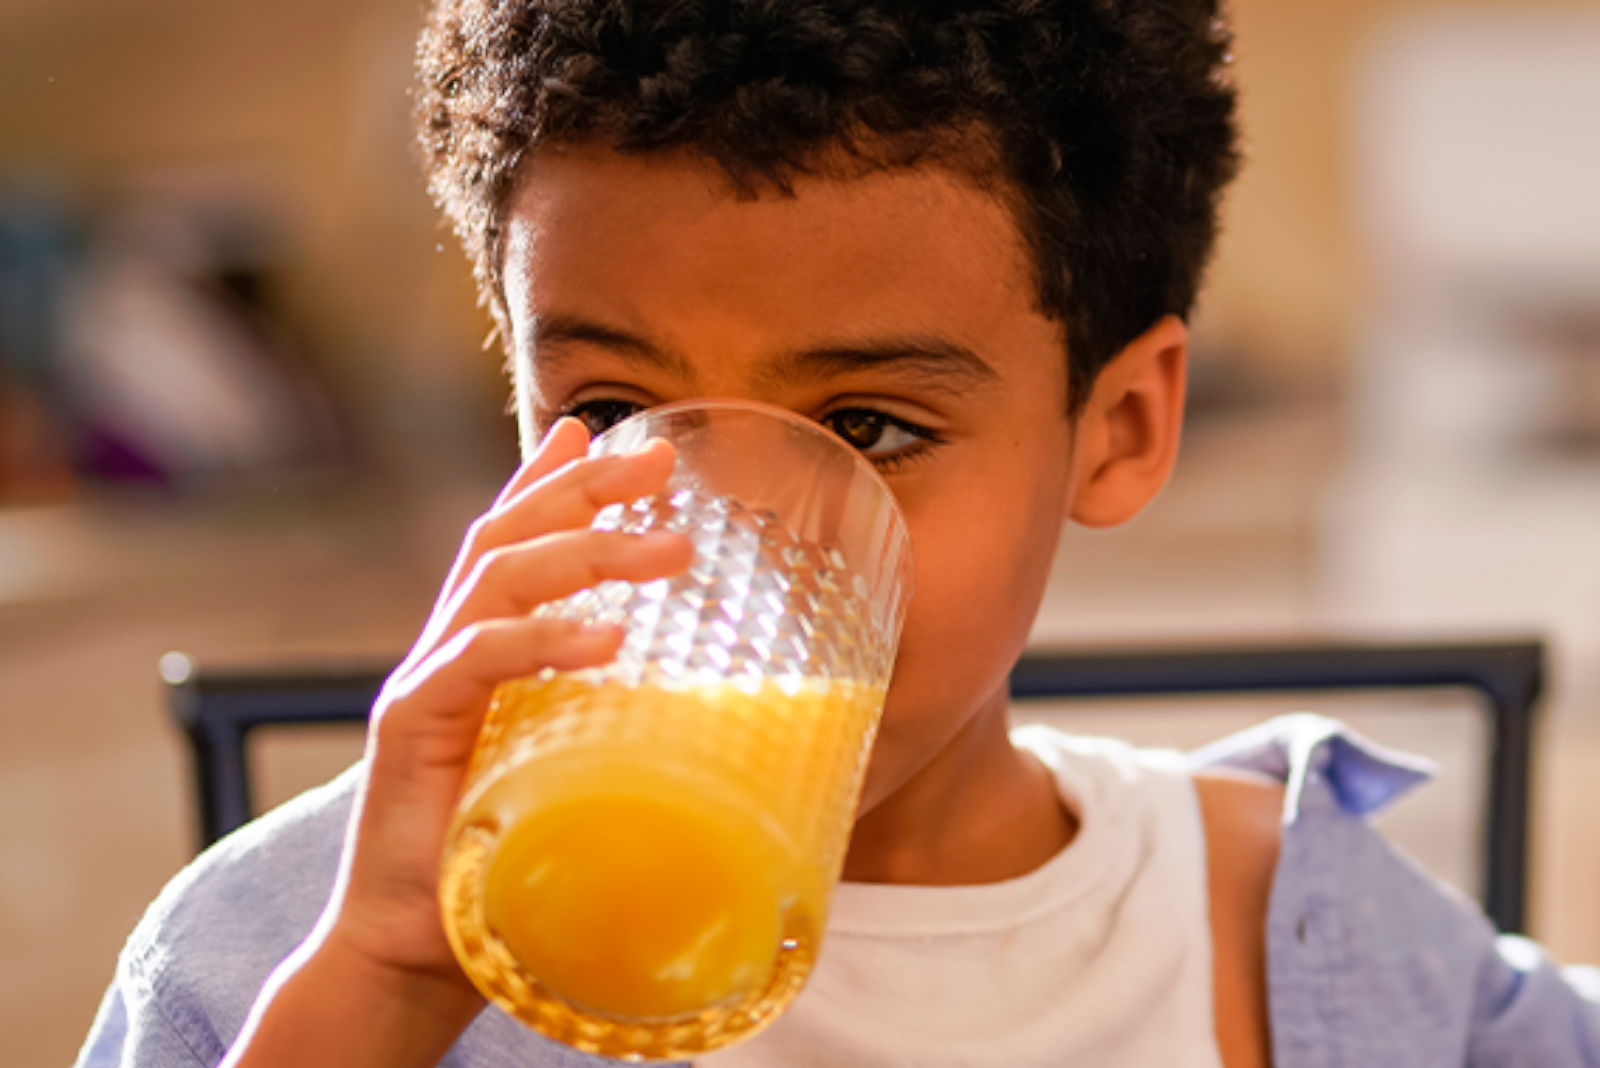 Should children avoid fruit juice?